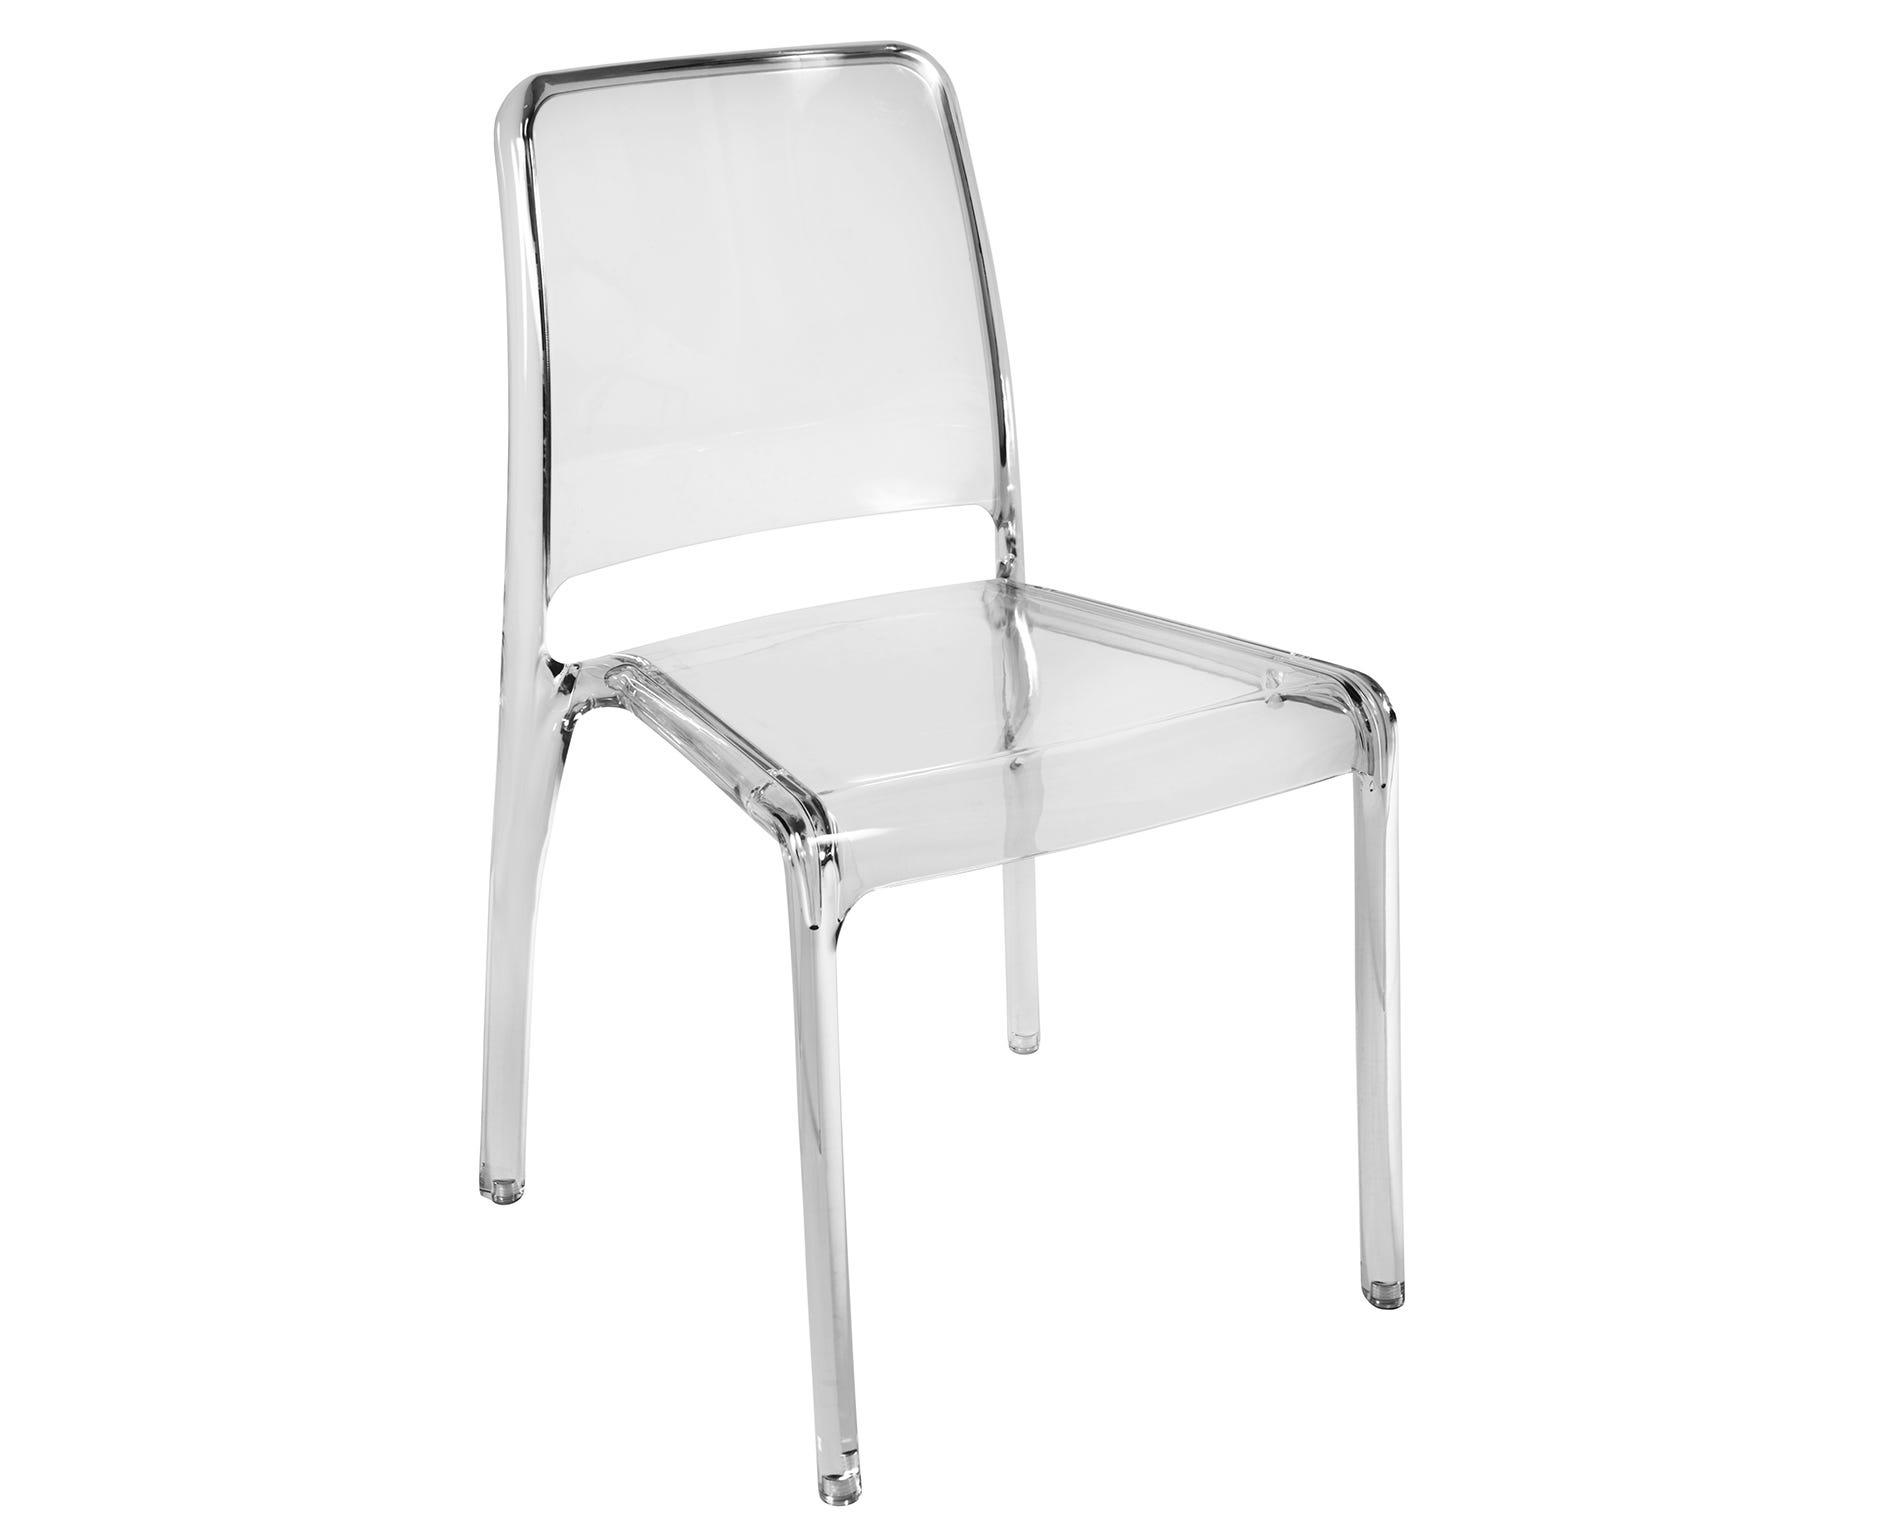 Canteen fice Chairs & Seating Furniture & Storage Ryman